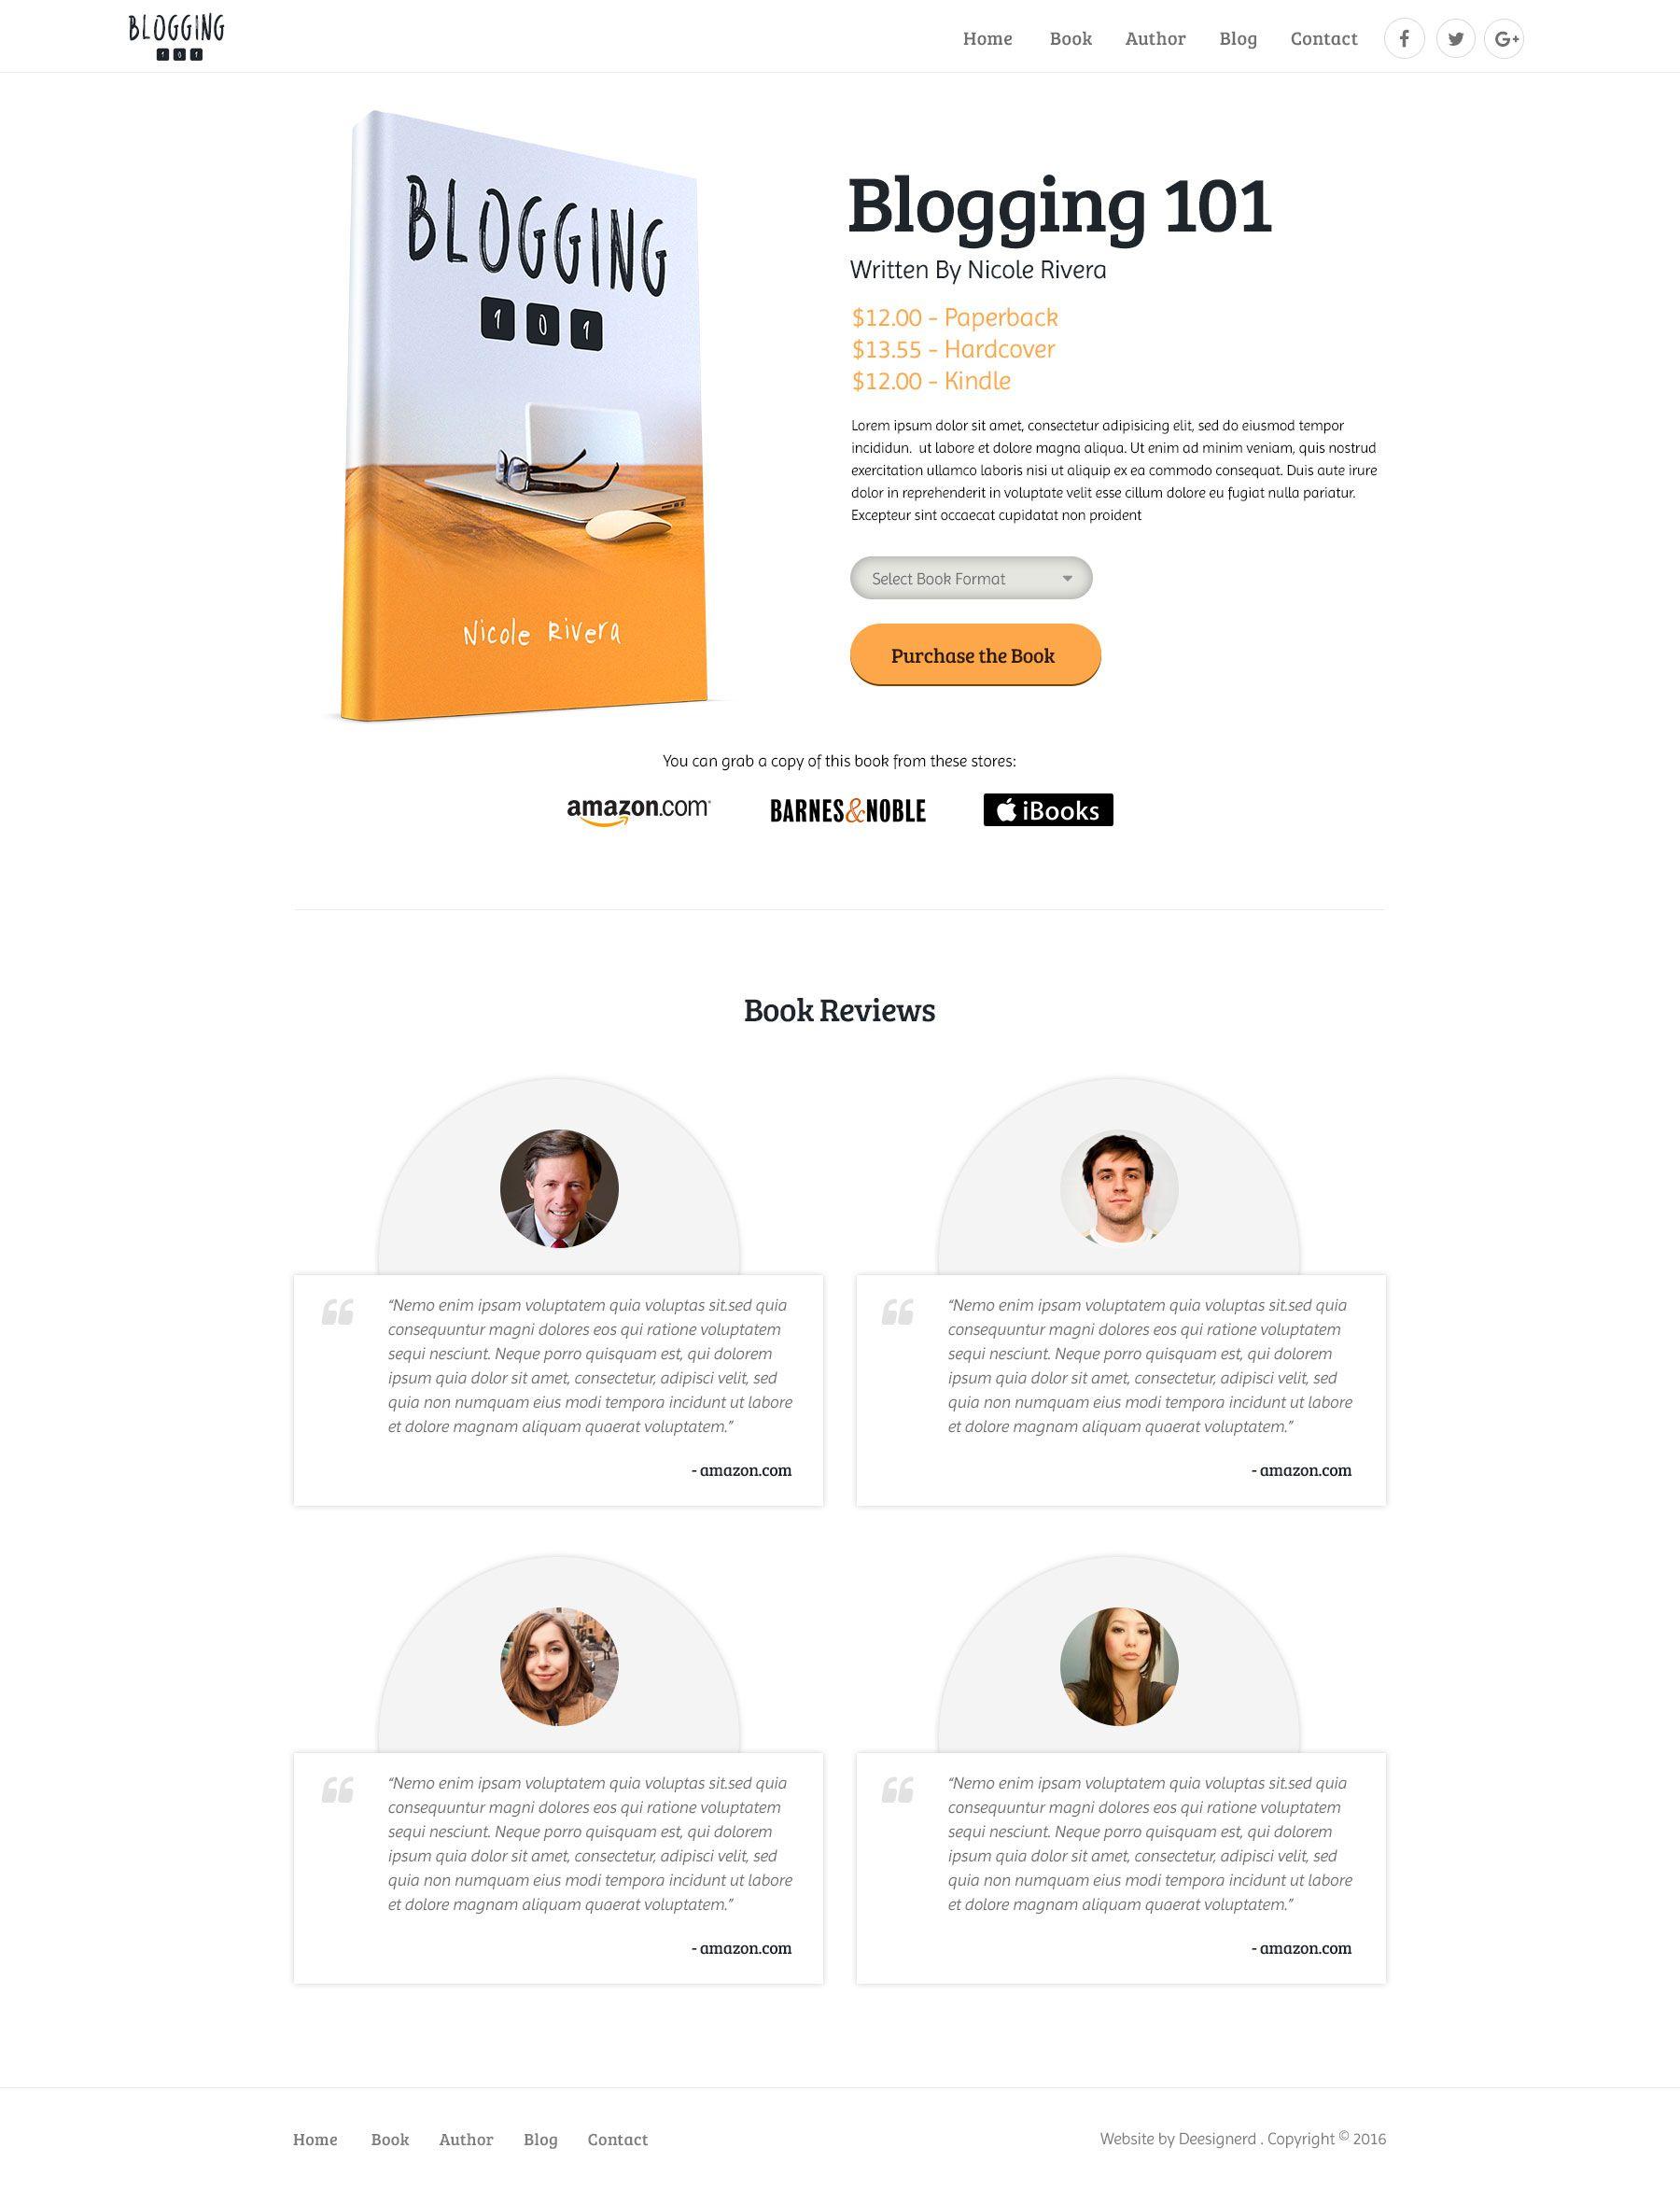 Single Book Page Webdesign Website Design Author Book Blogging Books Deesignerd Web Design Book Blog Website Design